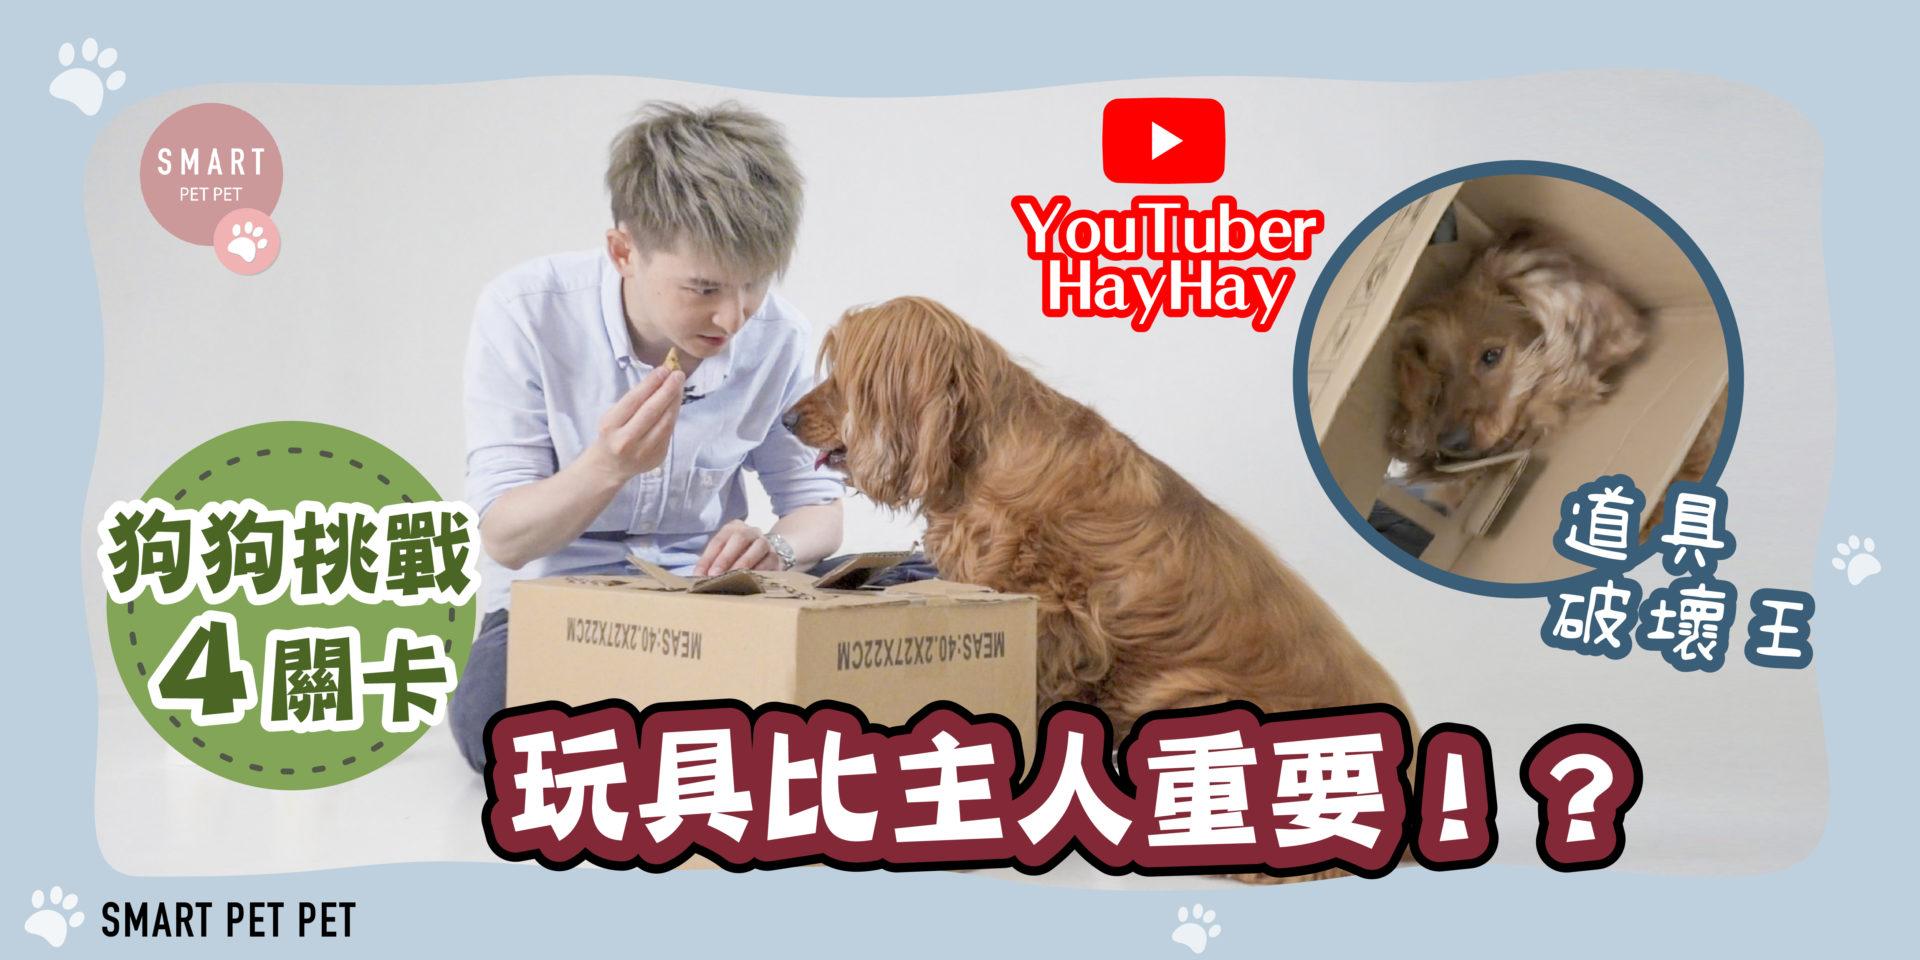 HayHay_狗_YouTuber_2_banner